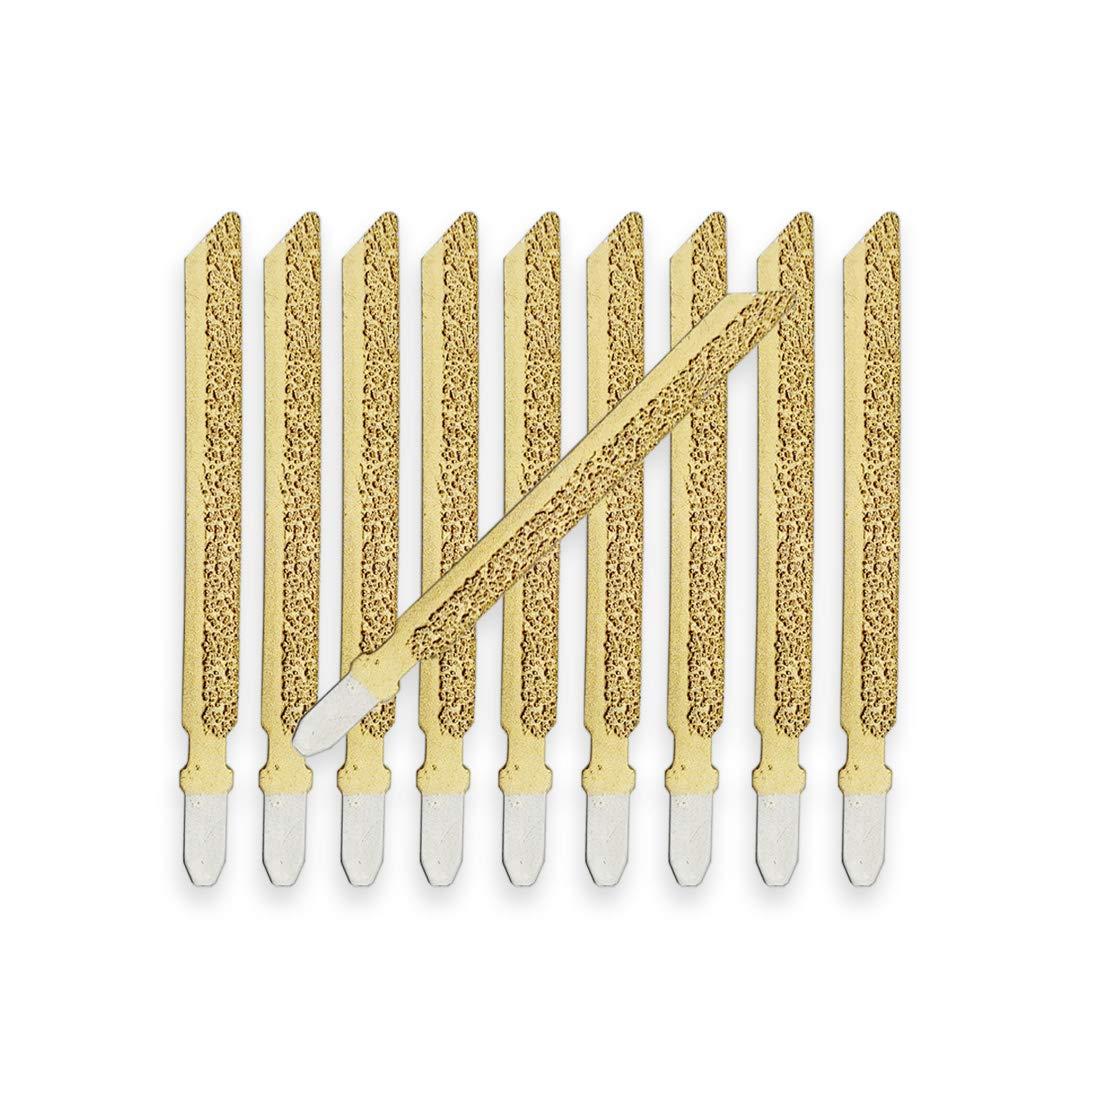 SHDIATOOL Diamond Jig Saw Blades for Granite Marble Ceramic Tile Brick Plastic 10pcs 4 inch/100mm High Professional Quality Vacuum Brazed Cutting Disc by SHDIATOOL